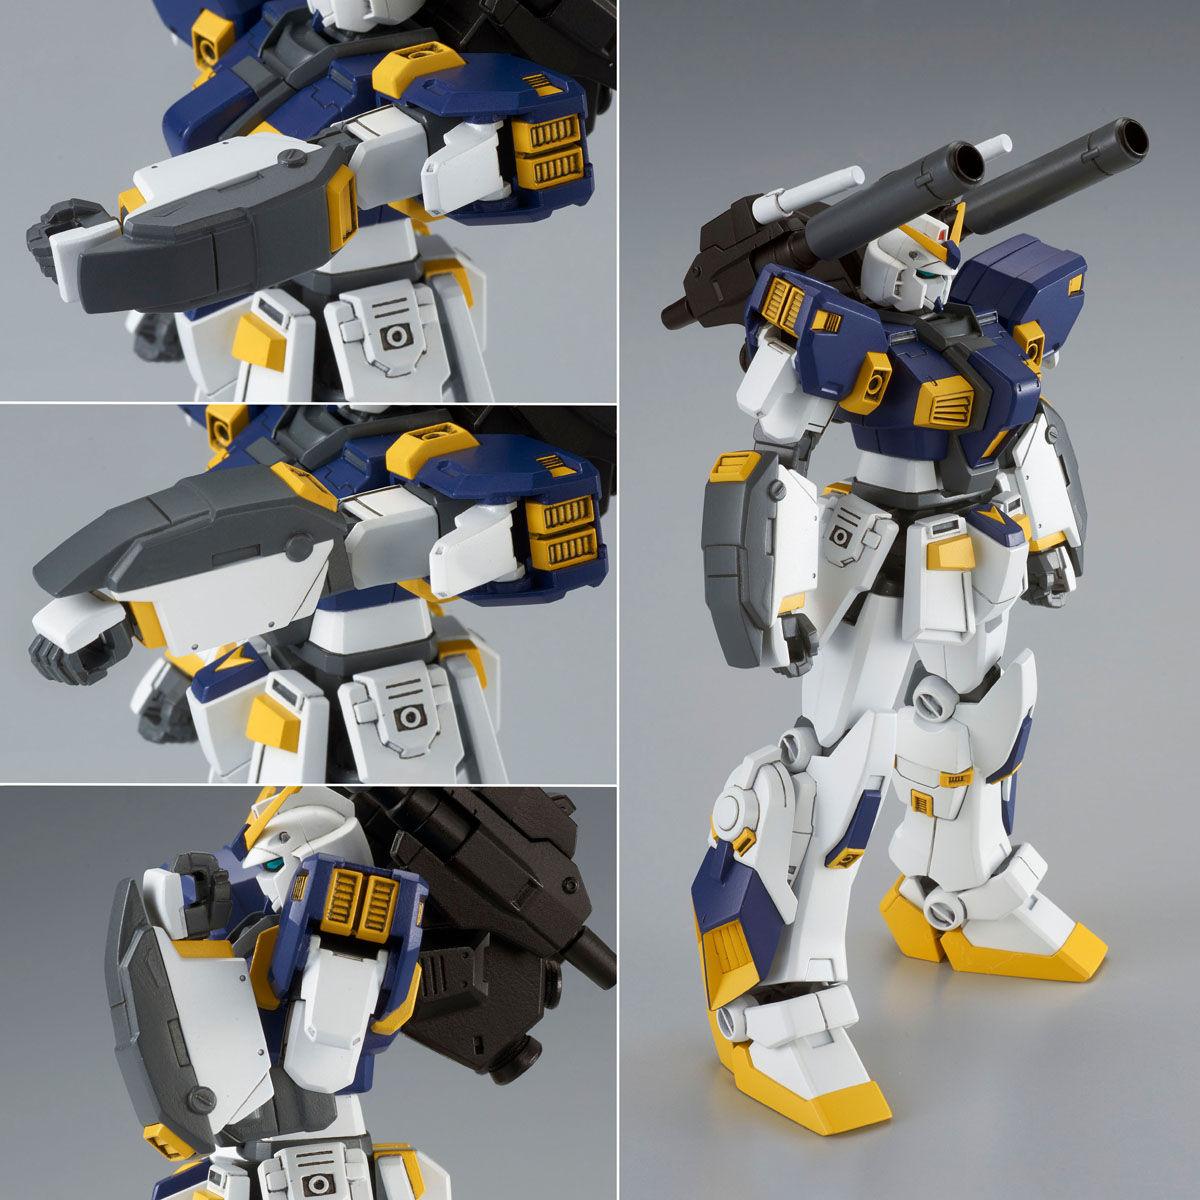 P-Bandai HGUC 1/144 RX-78-6 Mudrock Gundam (Madrock)